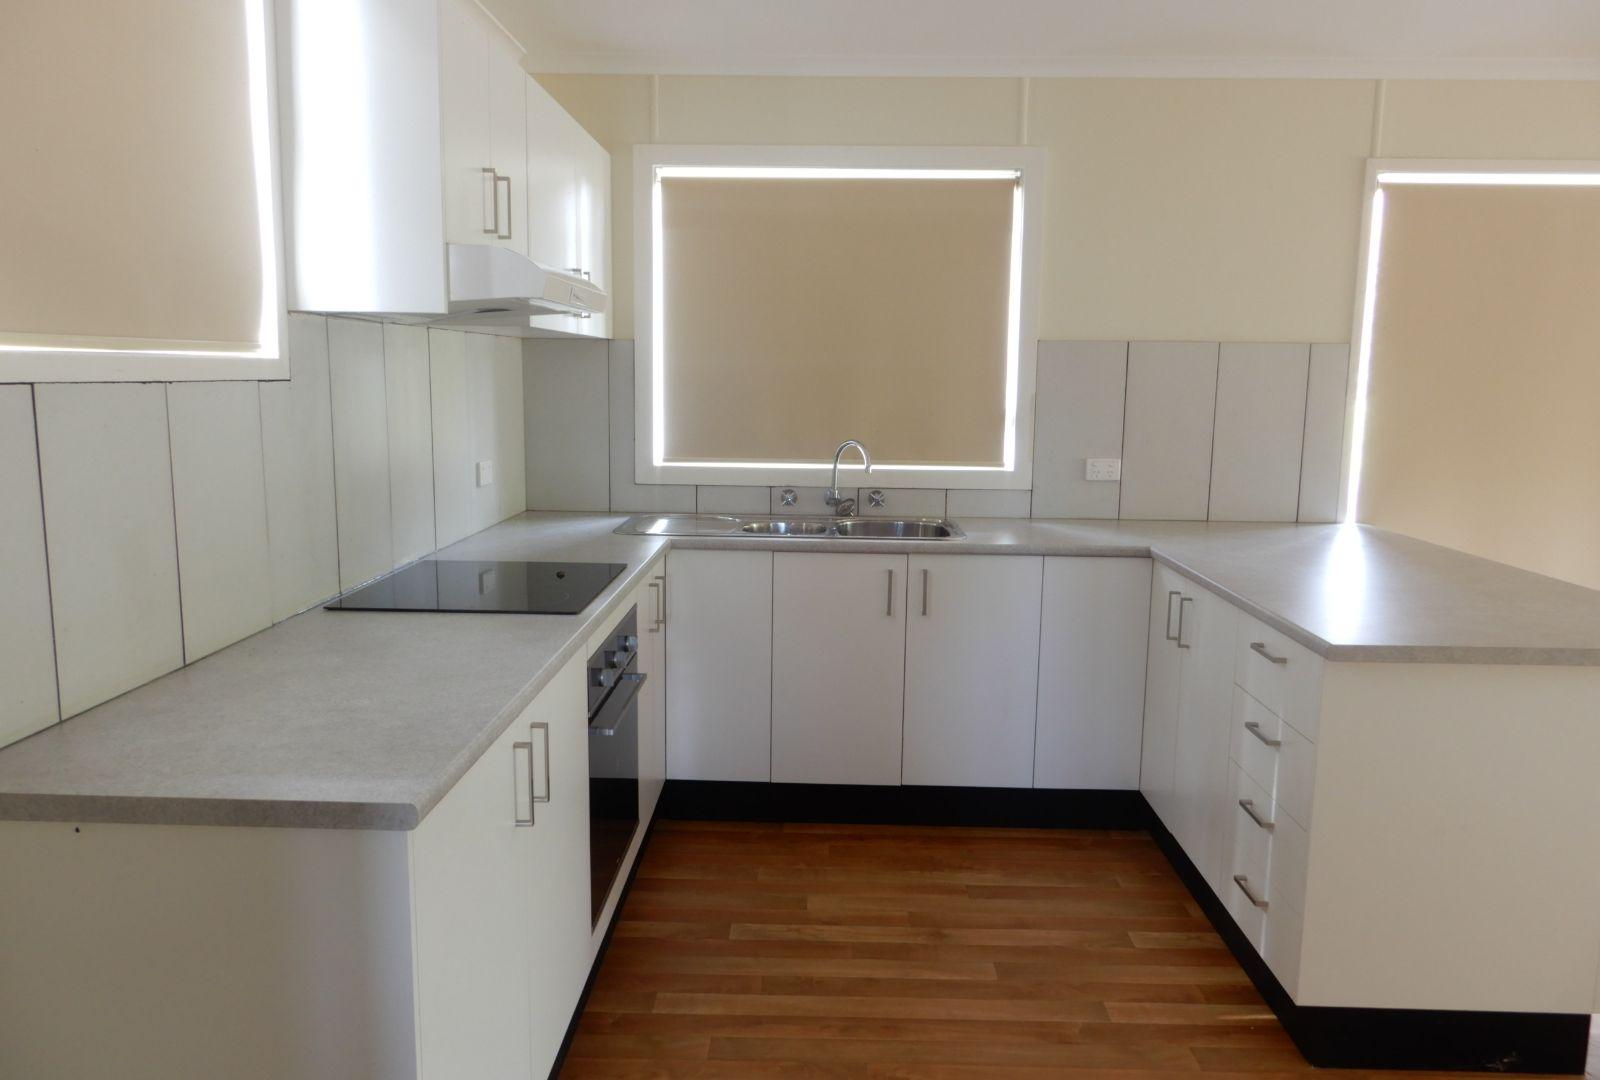 76 O'Connell Street, Murrurundi NSW 2338, Image 1